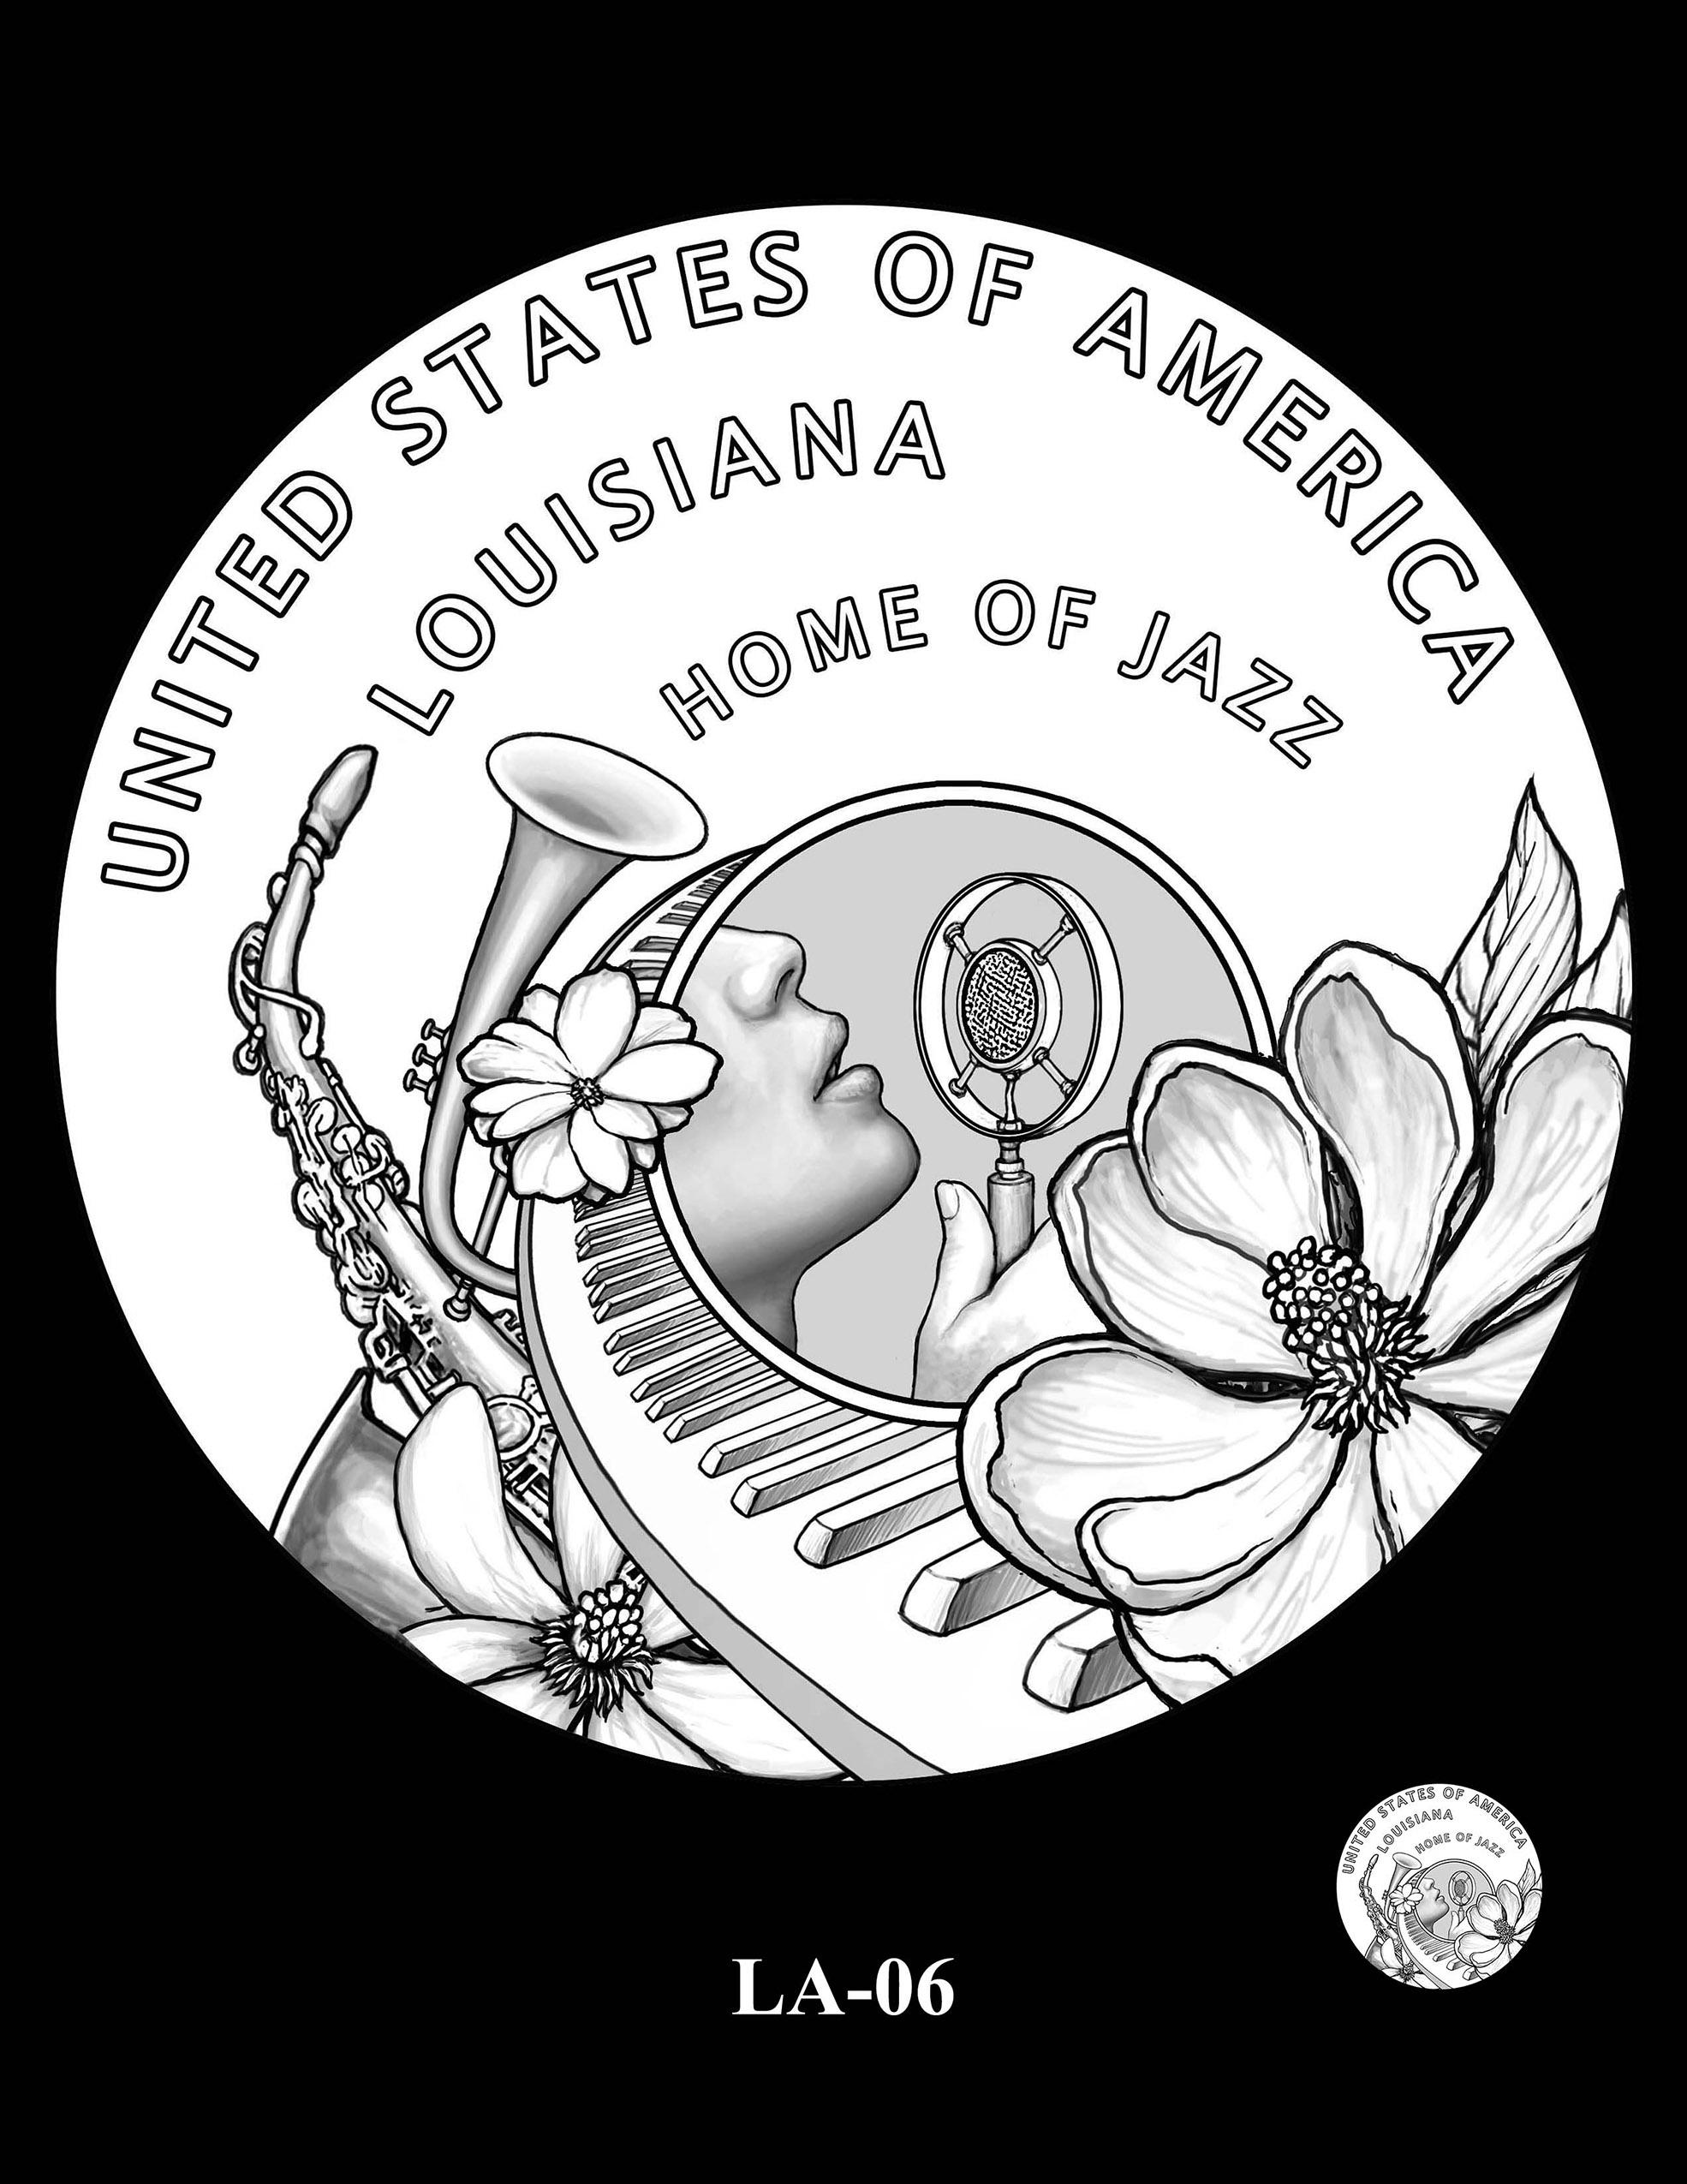 LA-06 -- 2023 American Innovation $1 Coin Program - Louisiana